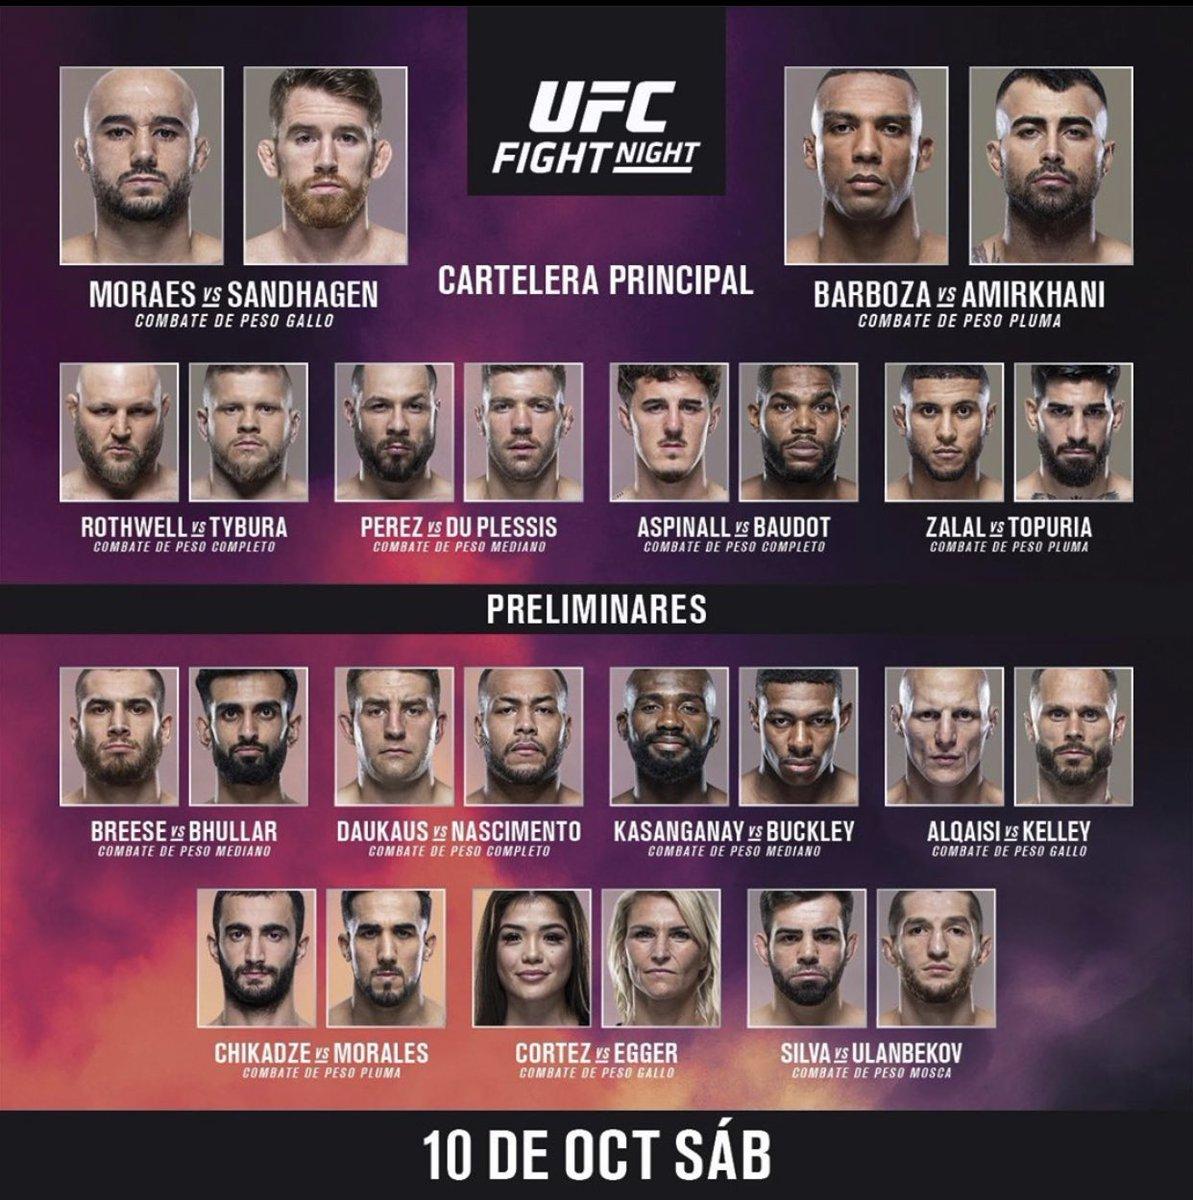 #UFCFightIsland5  #ufcfightnight • • #UFC #BELLATOR #ONEFC #RIZIN #COMBATEAMERICAS #ARESFC #M1GLOBAL #OKTAGONMMA #PFL #ACA #KSW #AFLMMA #CAGEWARRIORS #MMA #BJJ #BOXING #SPANISHMMA https://t.co/vuKgTvrKwp